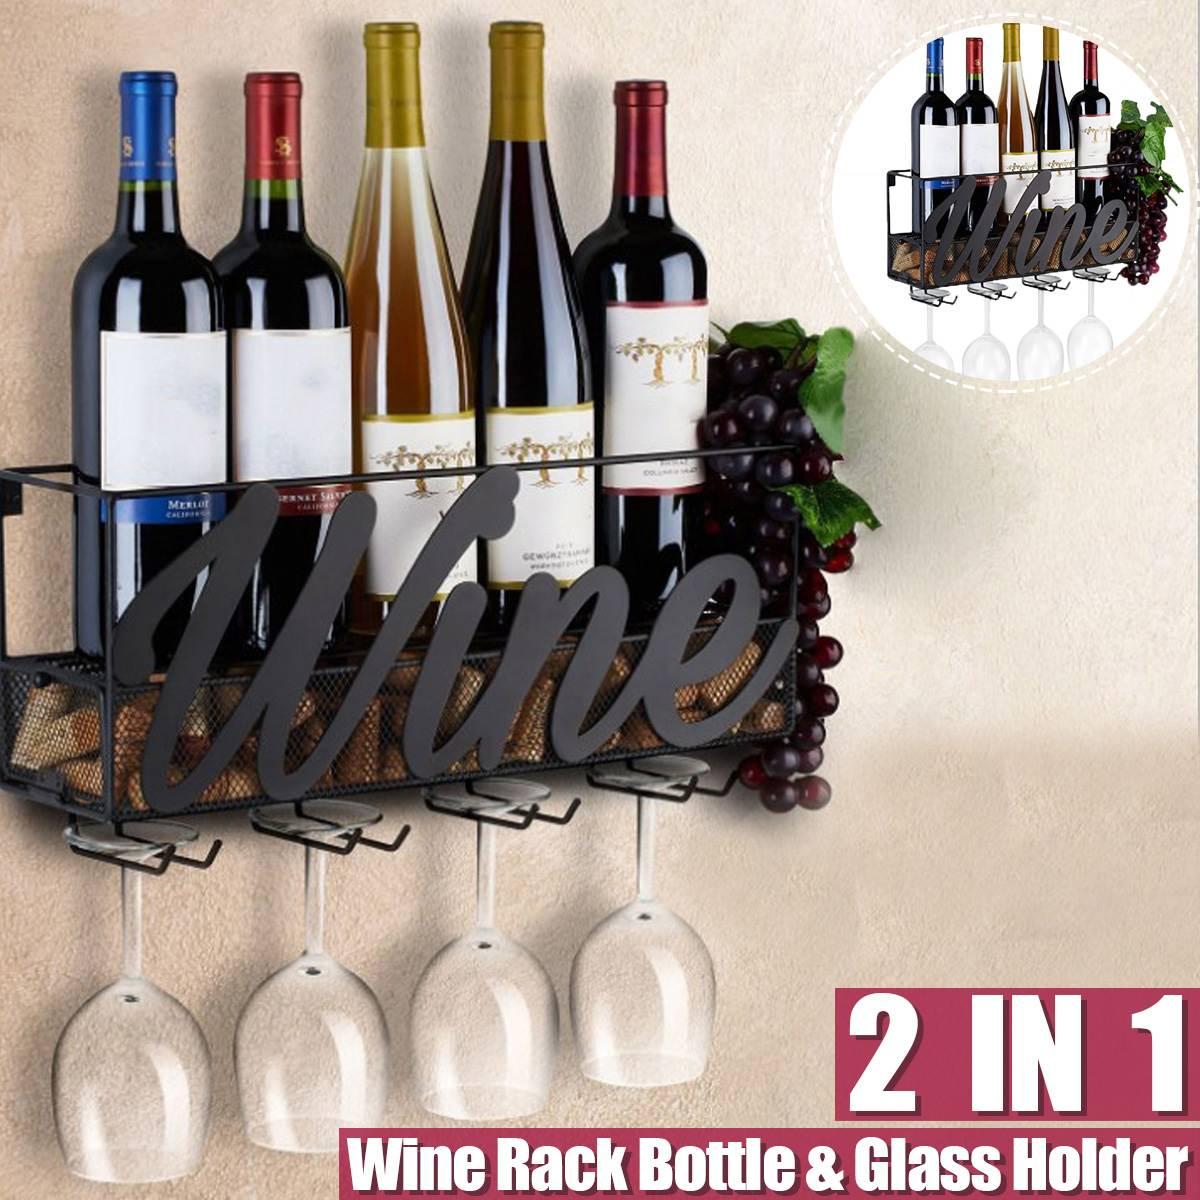 45x13x22 ซม.ติดผนัง Wine Rack ขวด Store แชมเปญชั้นวางของ 4 Built-in Wine แก้วและ Extra Cork ถาด